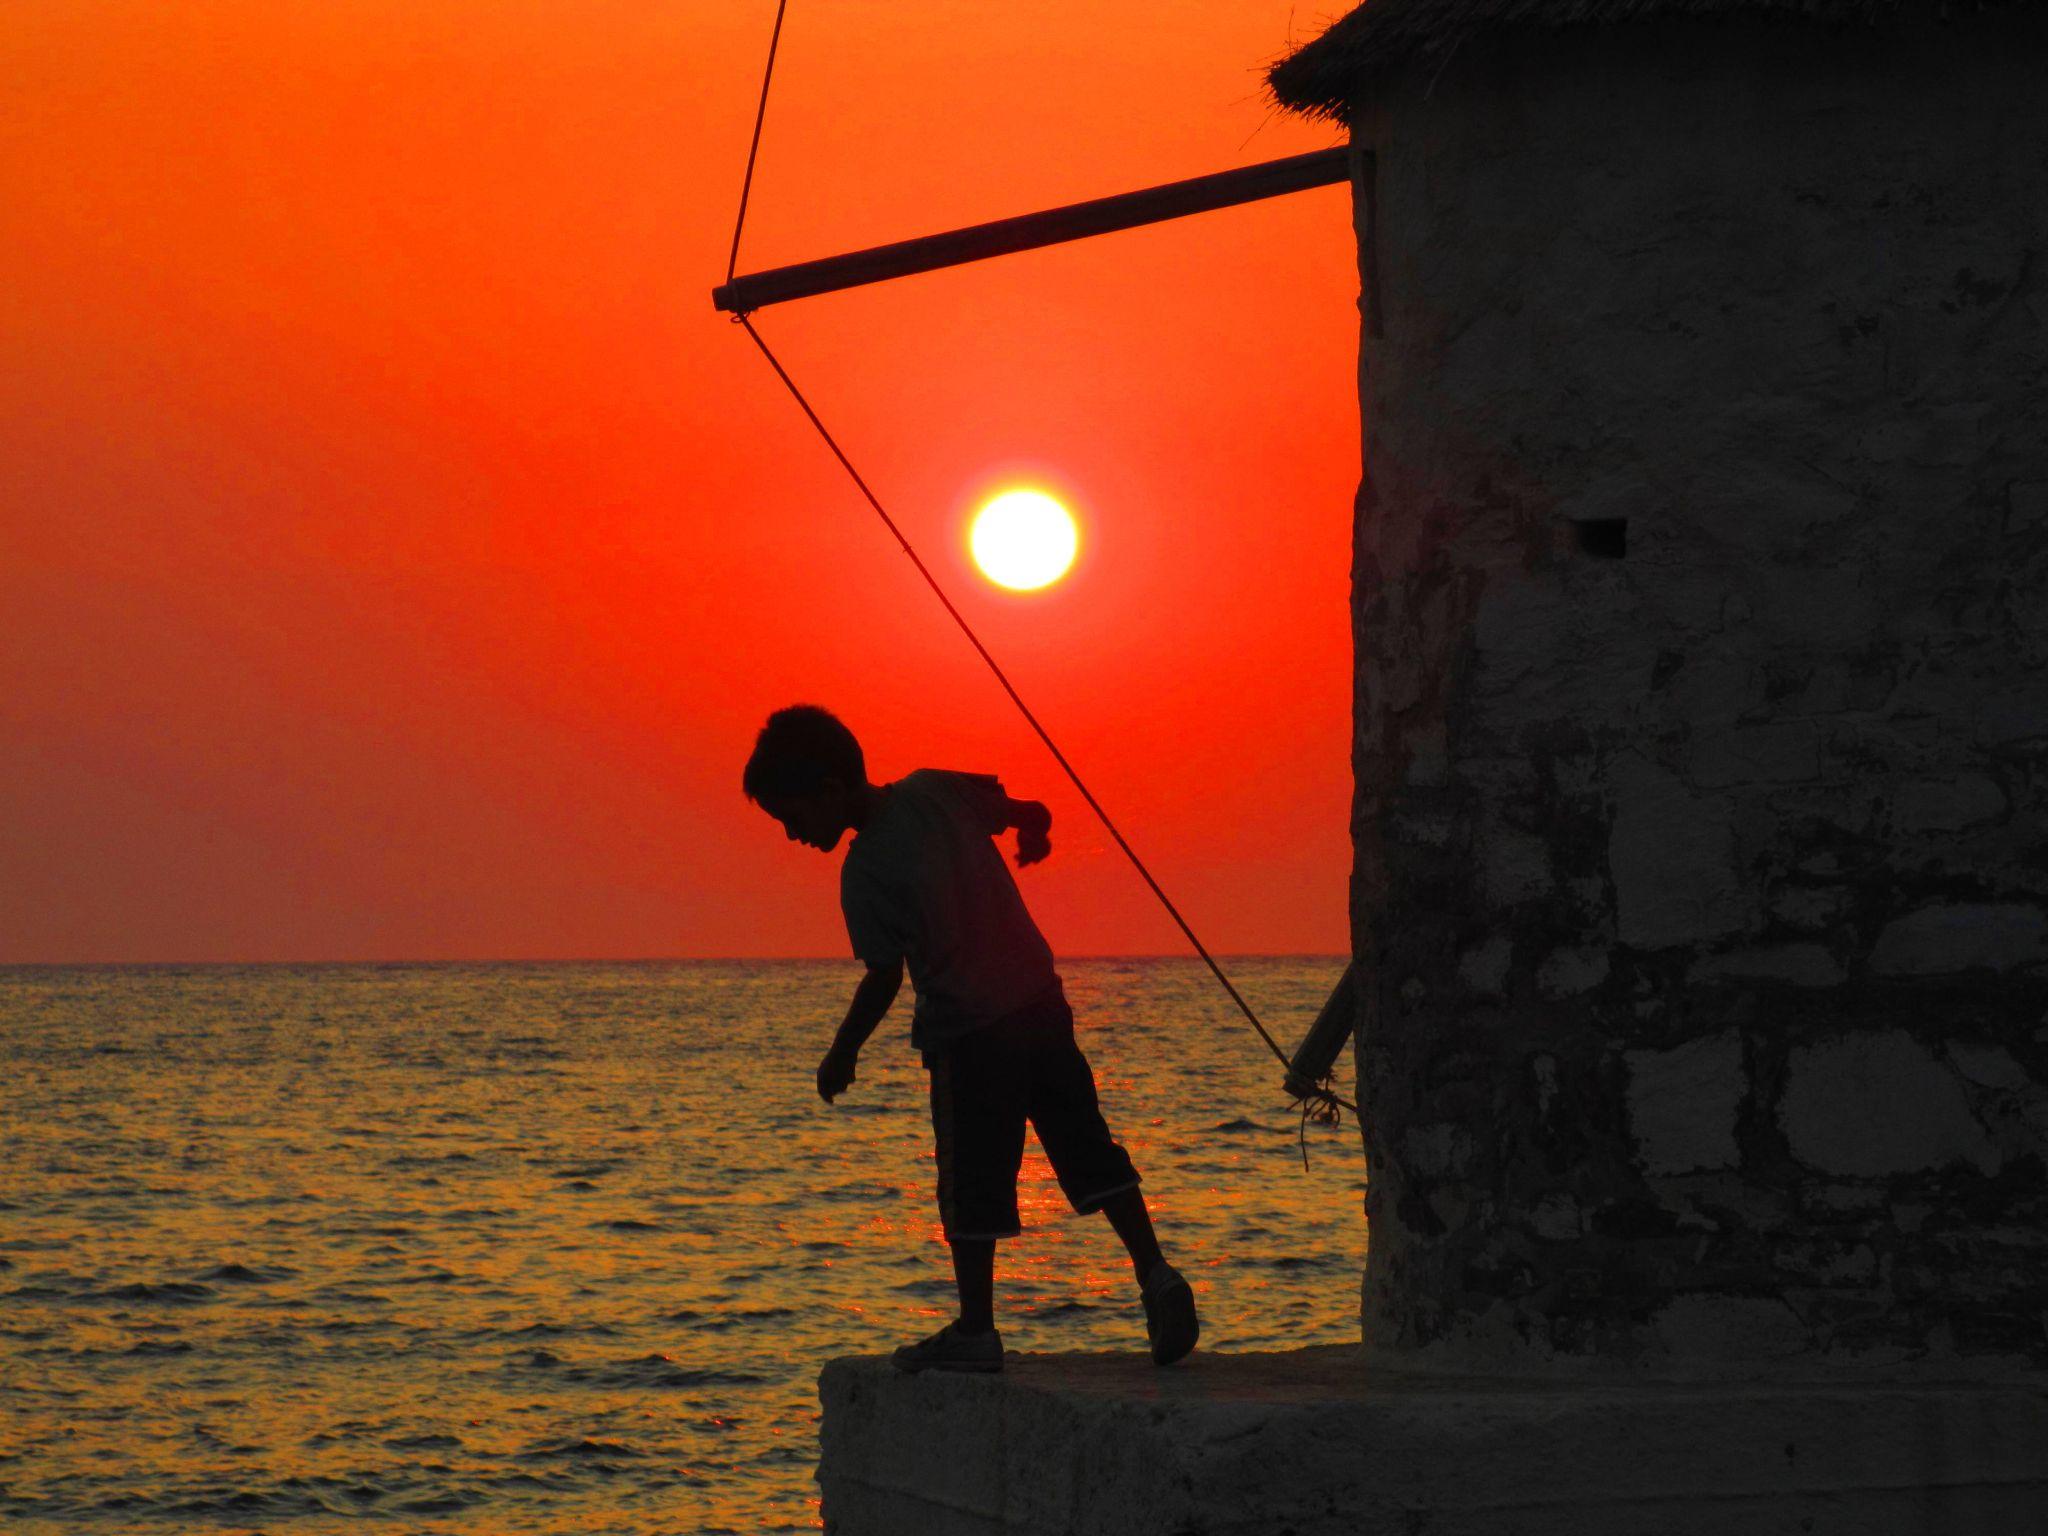 Sunset fishing, Kasos Island, Greece by kasiospaul